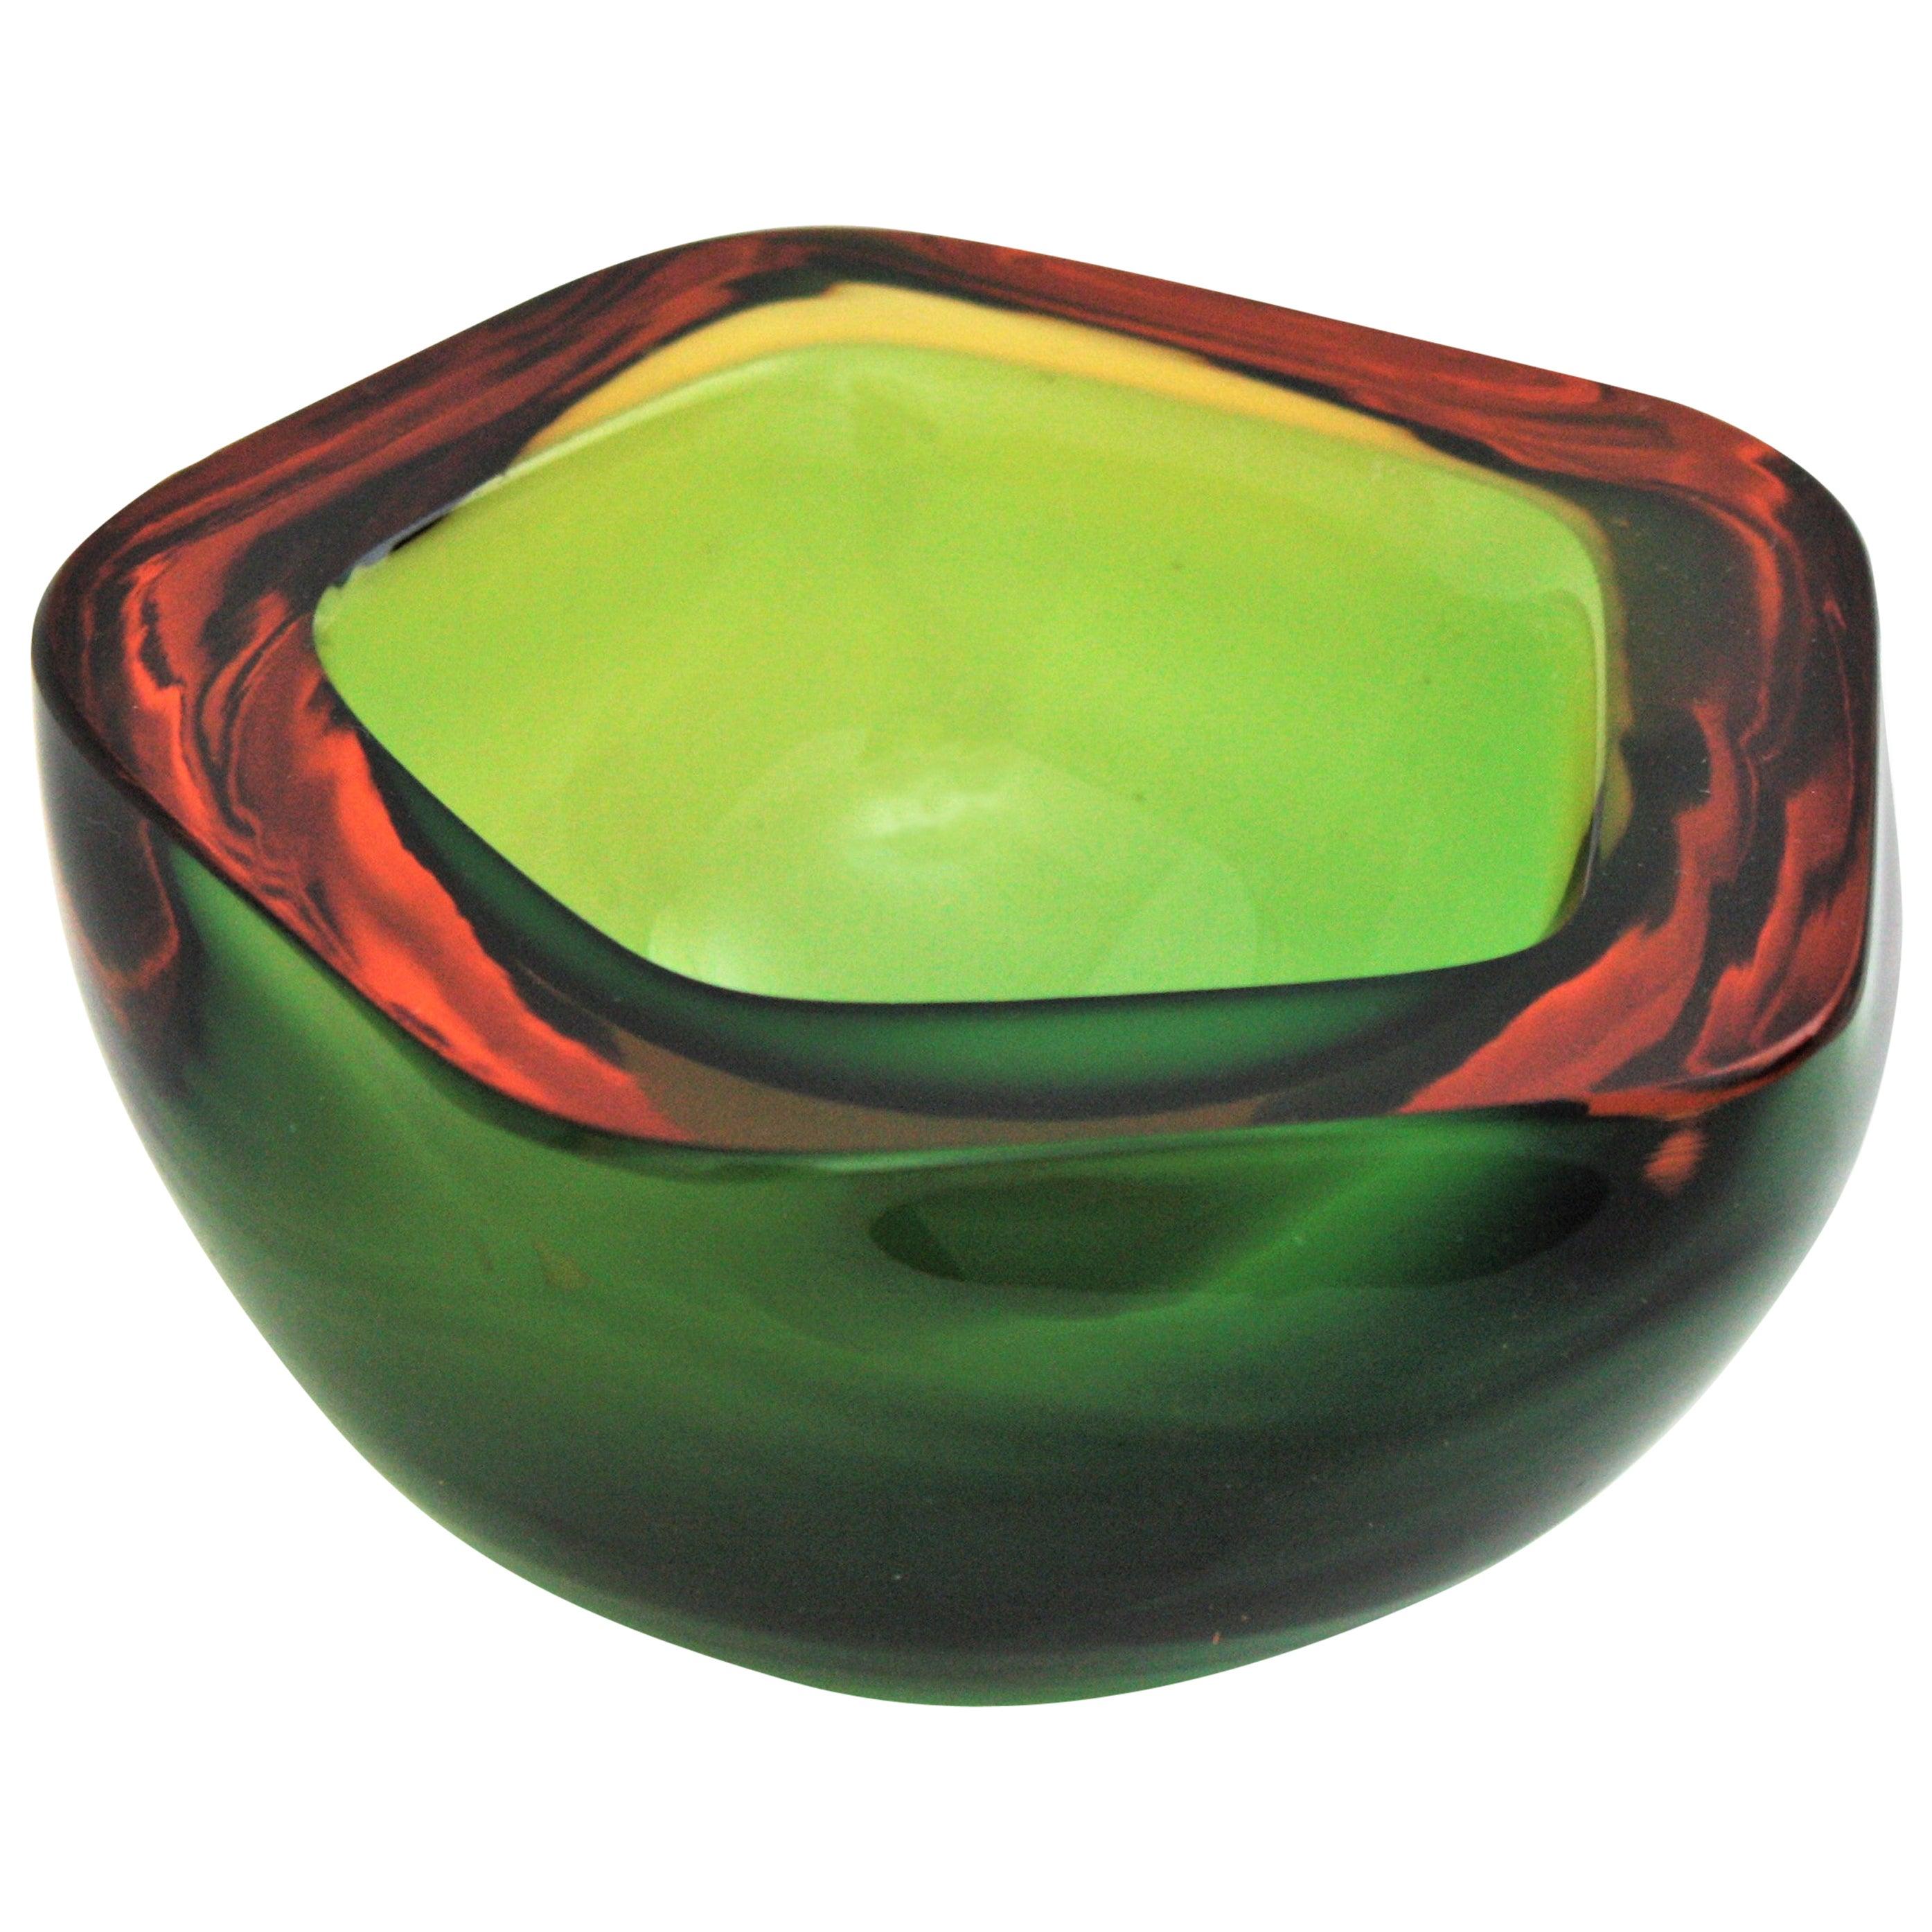 Flavio Poli Seguso Murano Art Glass Sommerso Green Amber Bowl